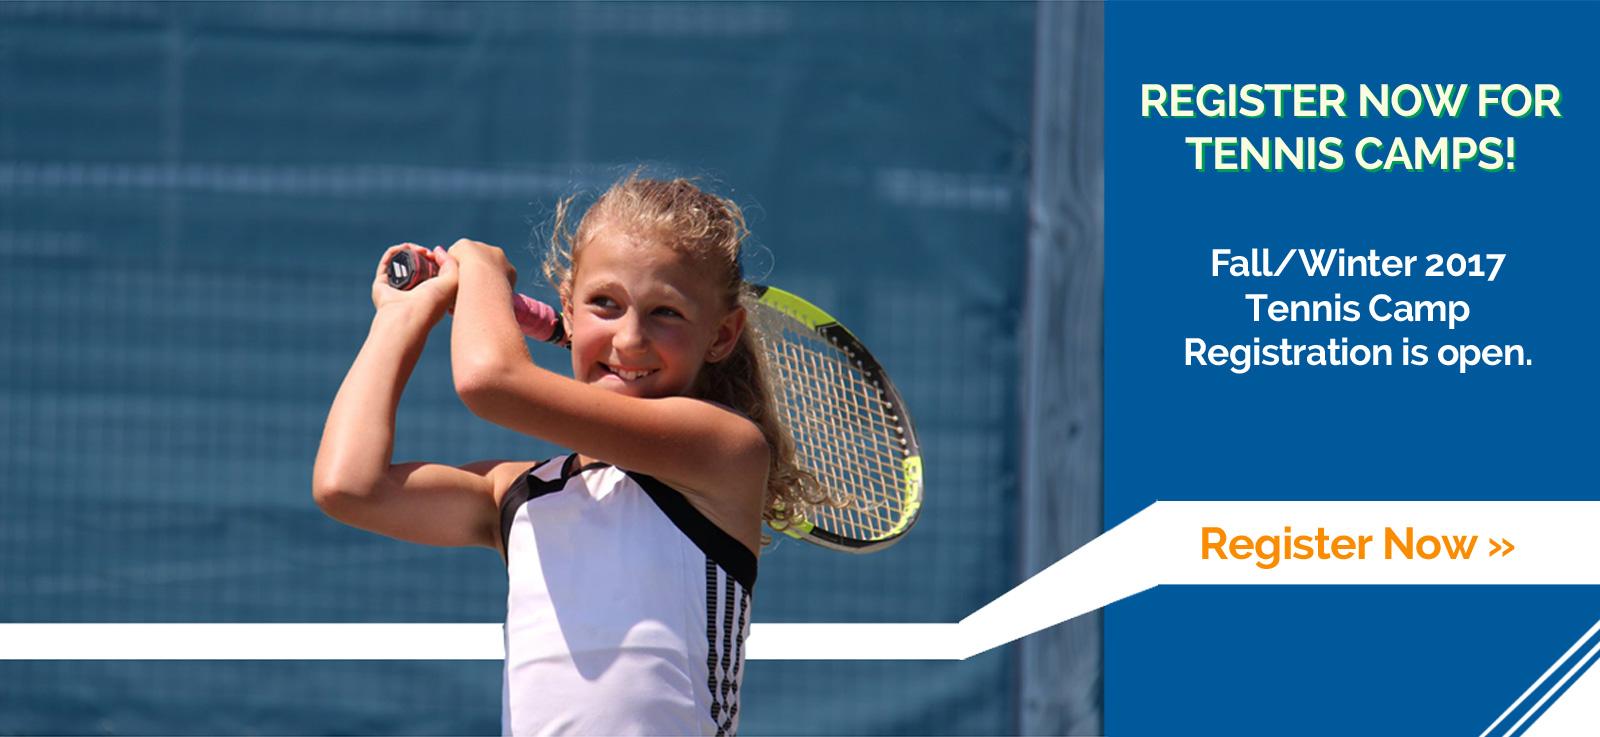 register for tennis camp